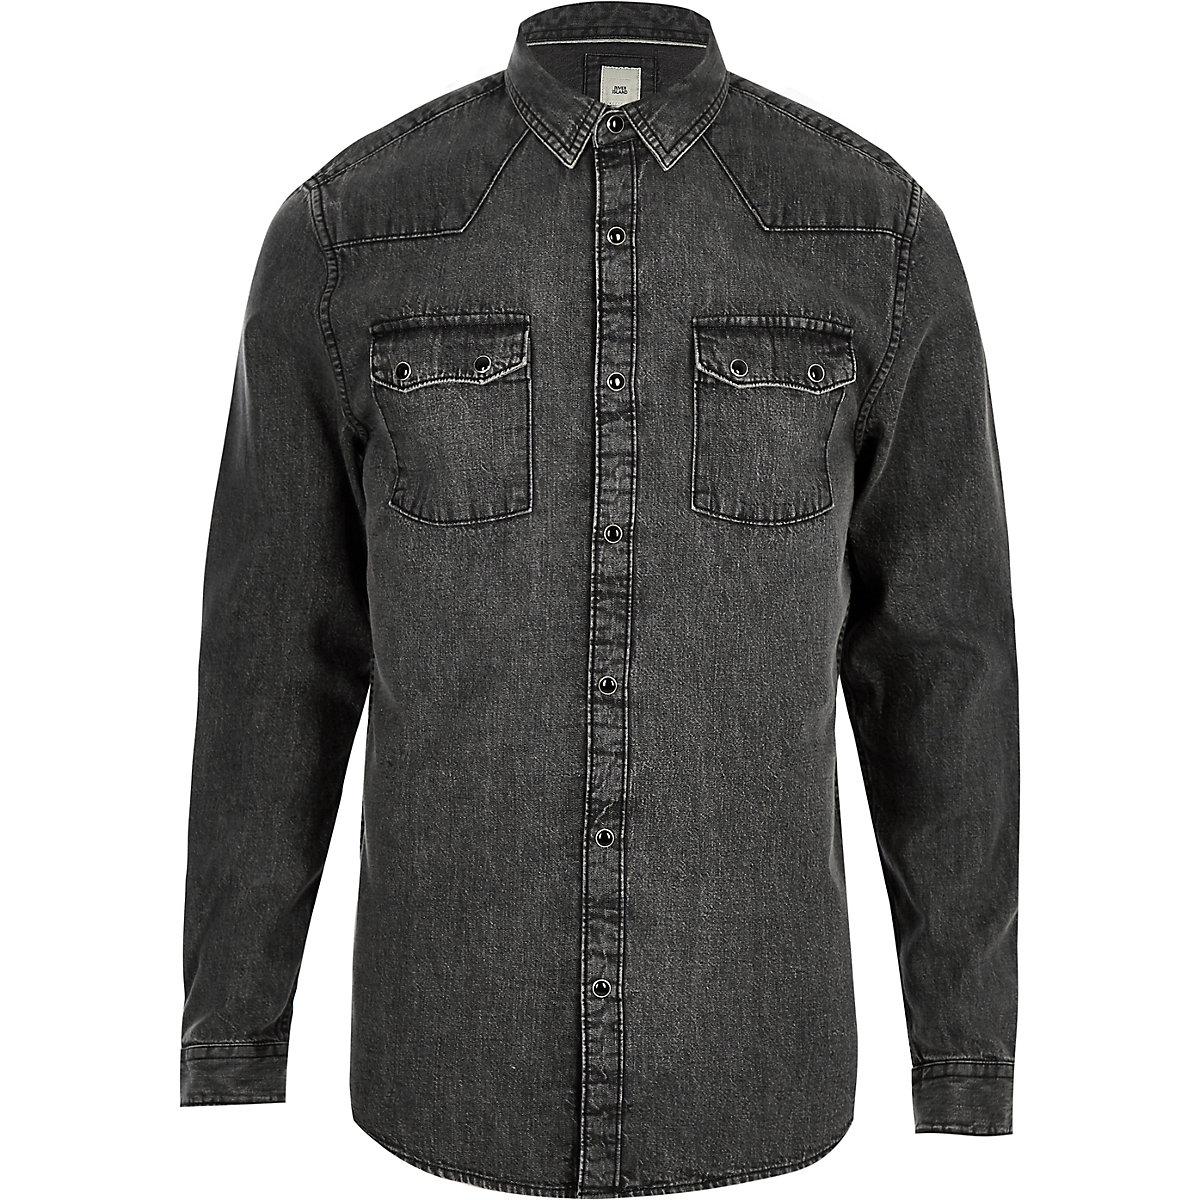 Grey acid wash long sleeve denim shirt